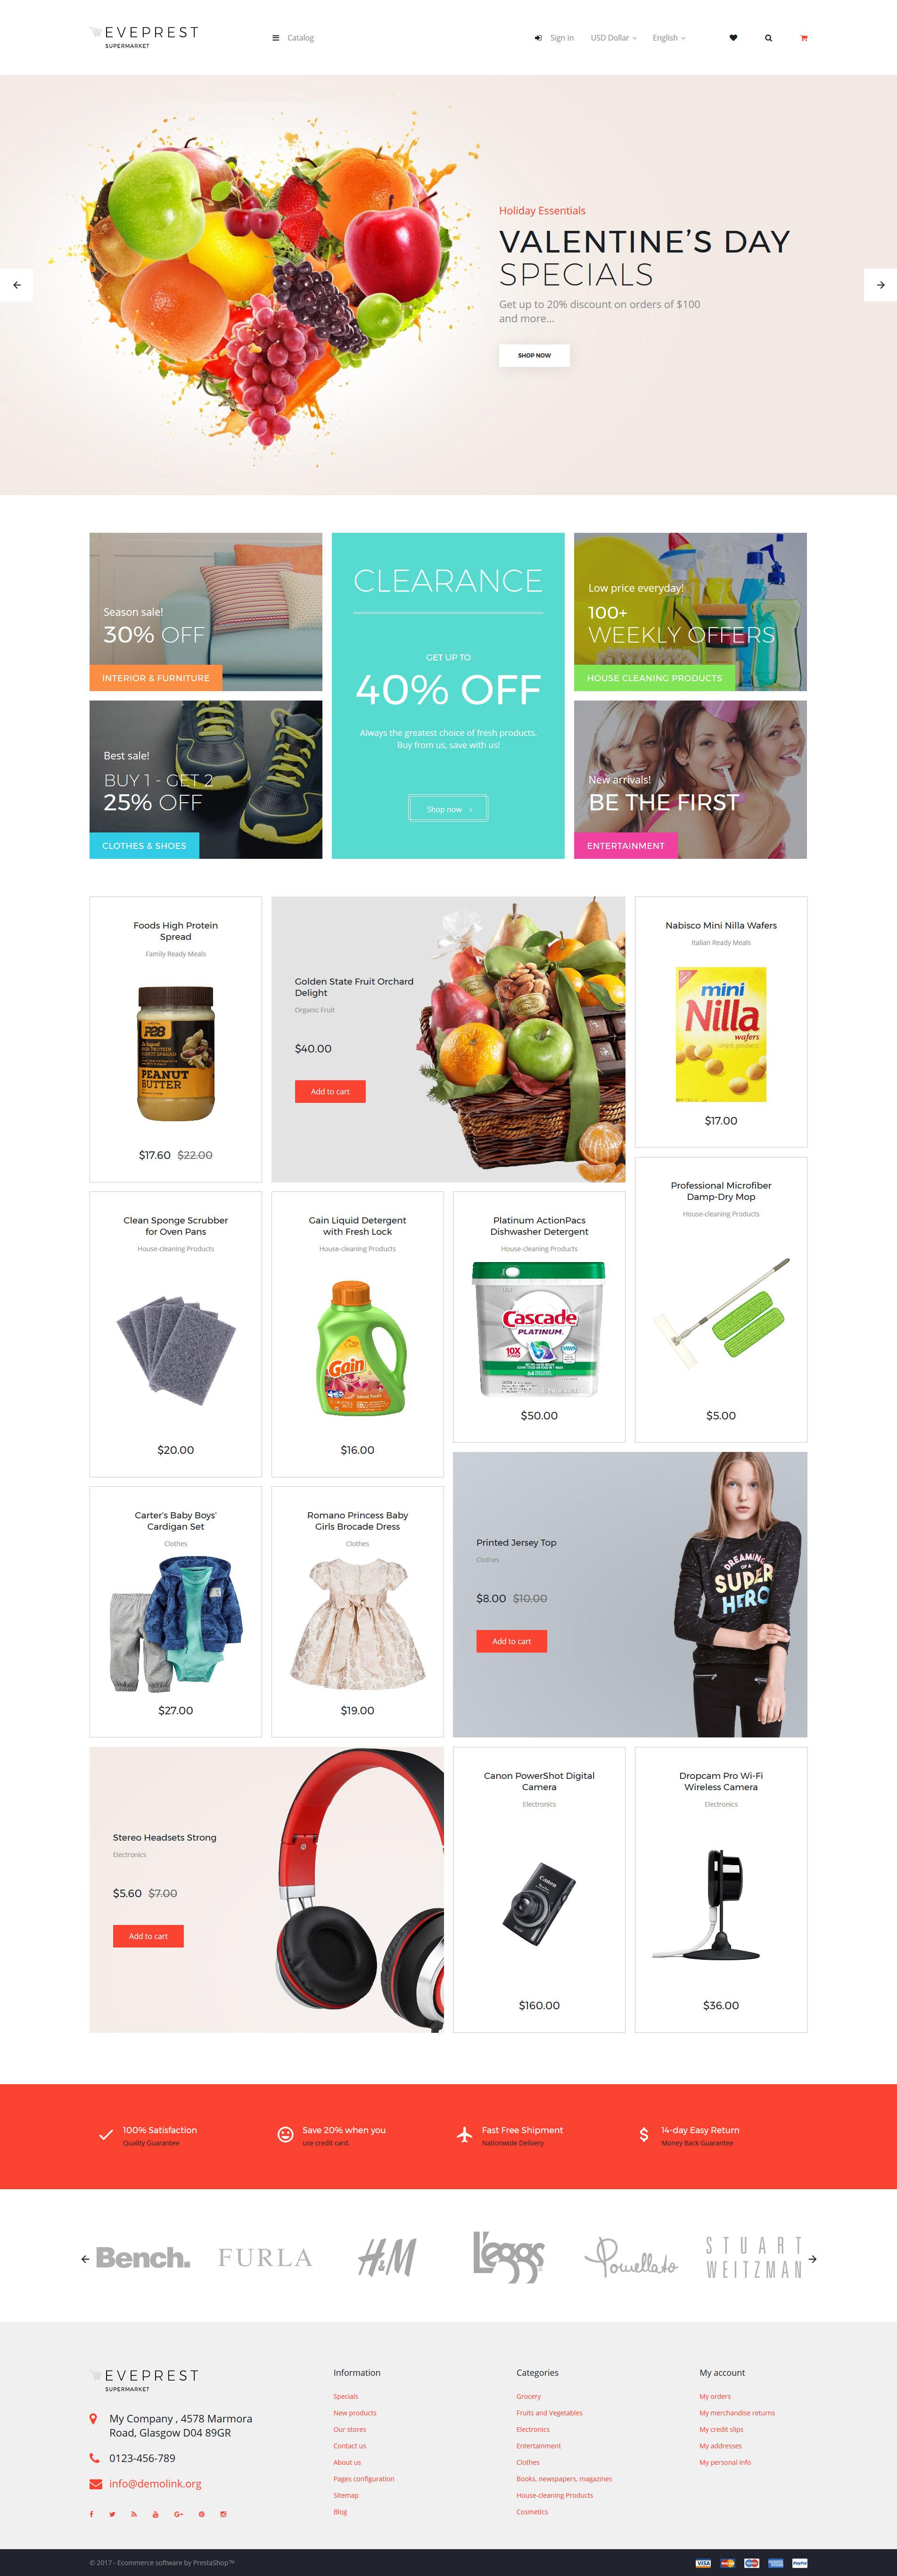 Responsivt Eveprest - Supermarket PrestaShop-tema #62387 - skärmbild